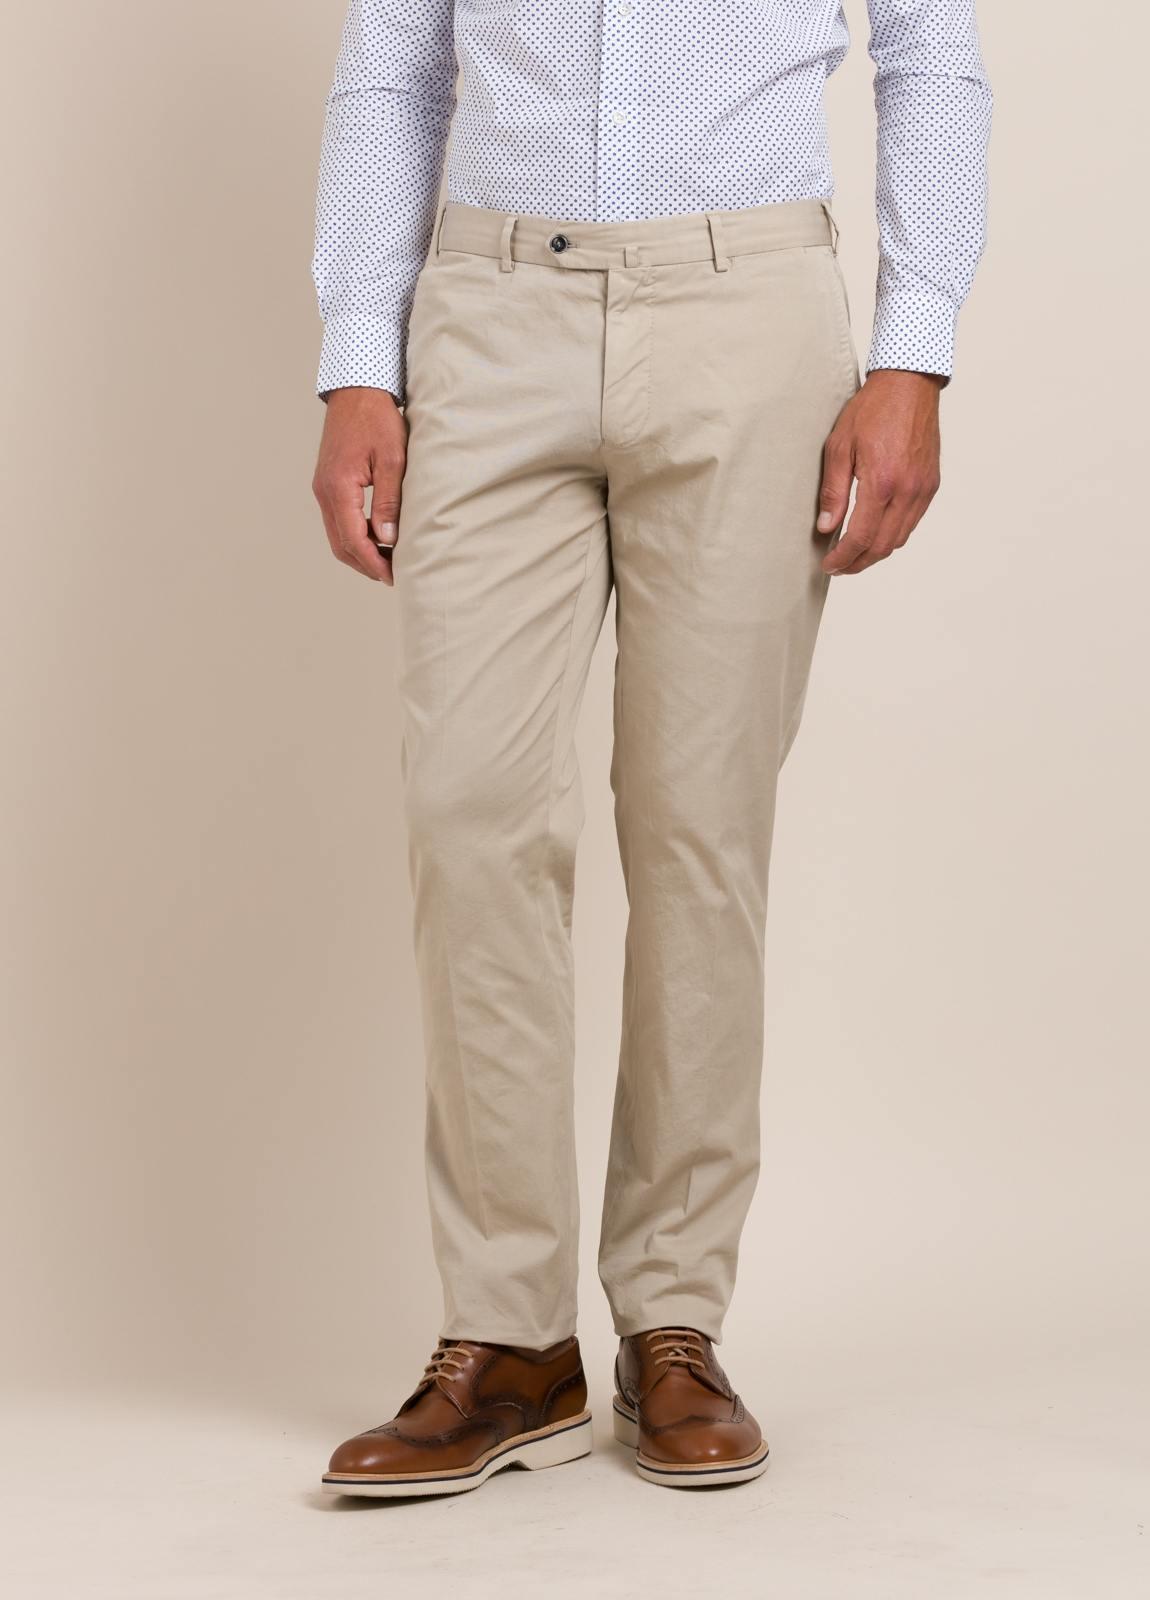 Pantalón chino FUREST COLECCIÓN Slim Fit beige - Ítem2